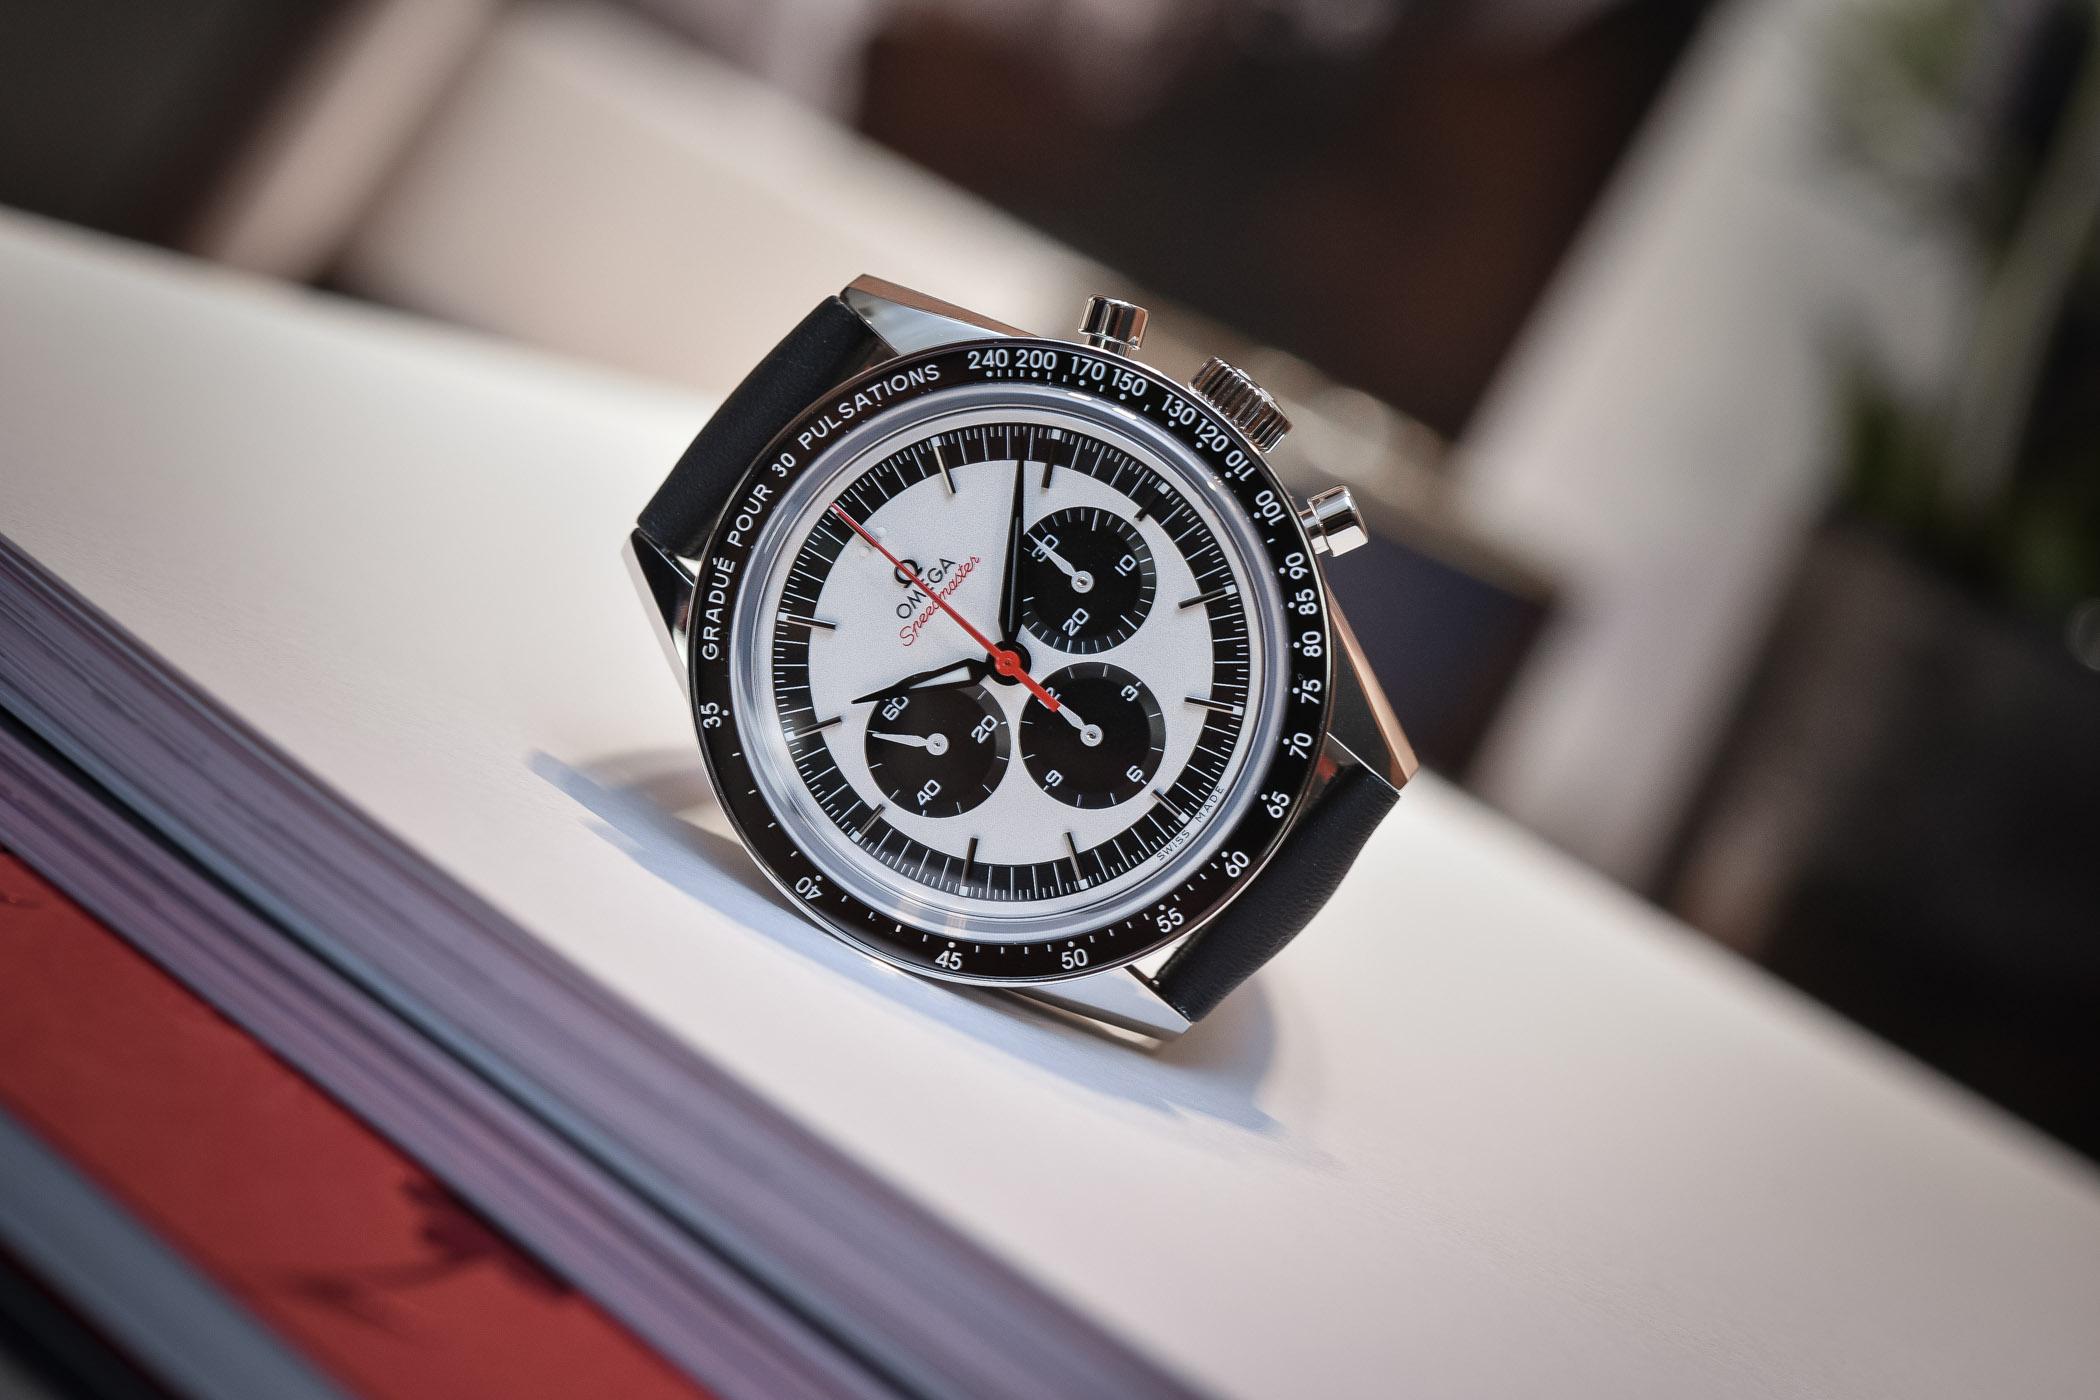 Omega Speedmaster CK2998 Pulsometer Panda 311.32.40.30.02.001 - Baselworld 2018